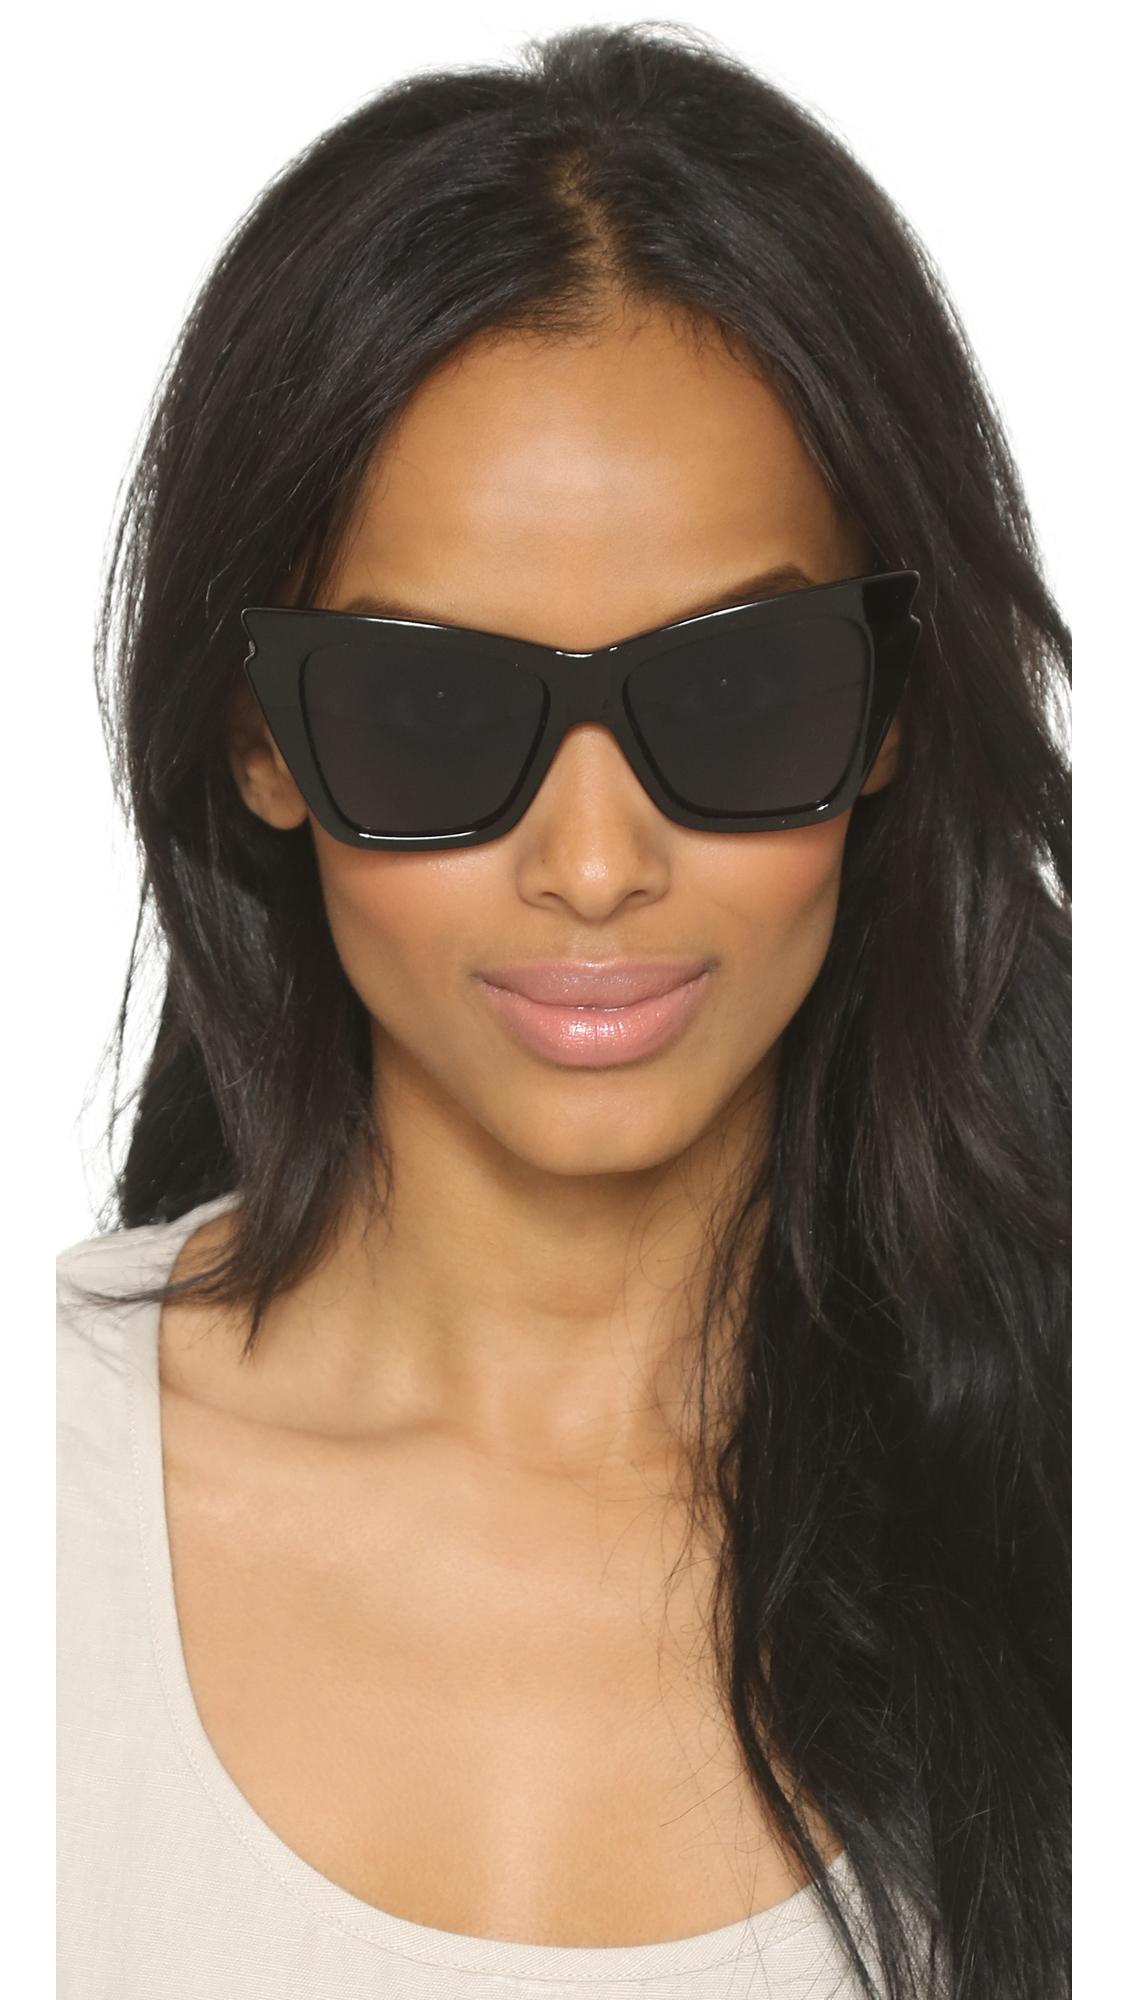 Rapture Cat-eye Acetate Sunglasses - Black Le Specs qEyPsK0CB